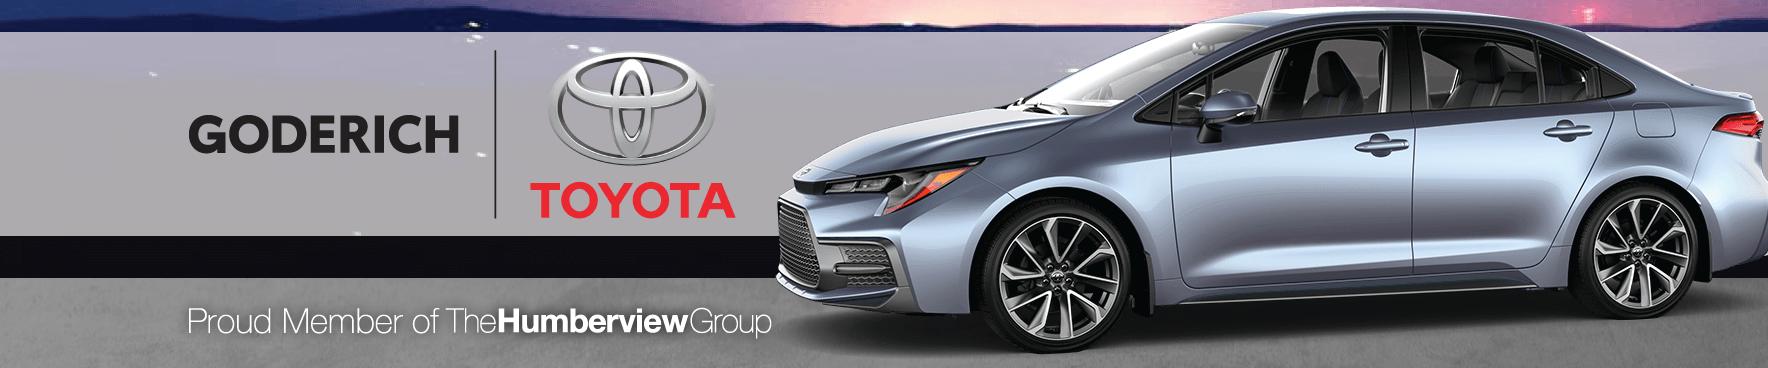 Goderich Toyota